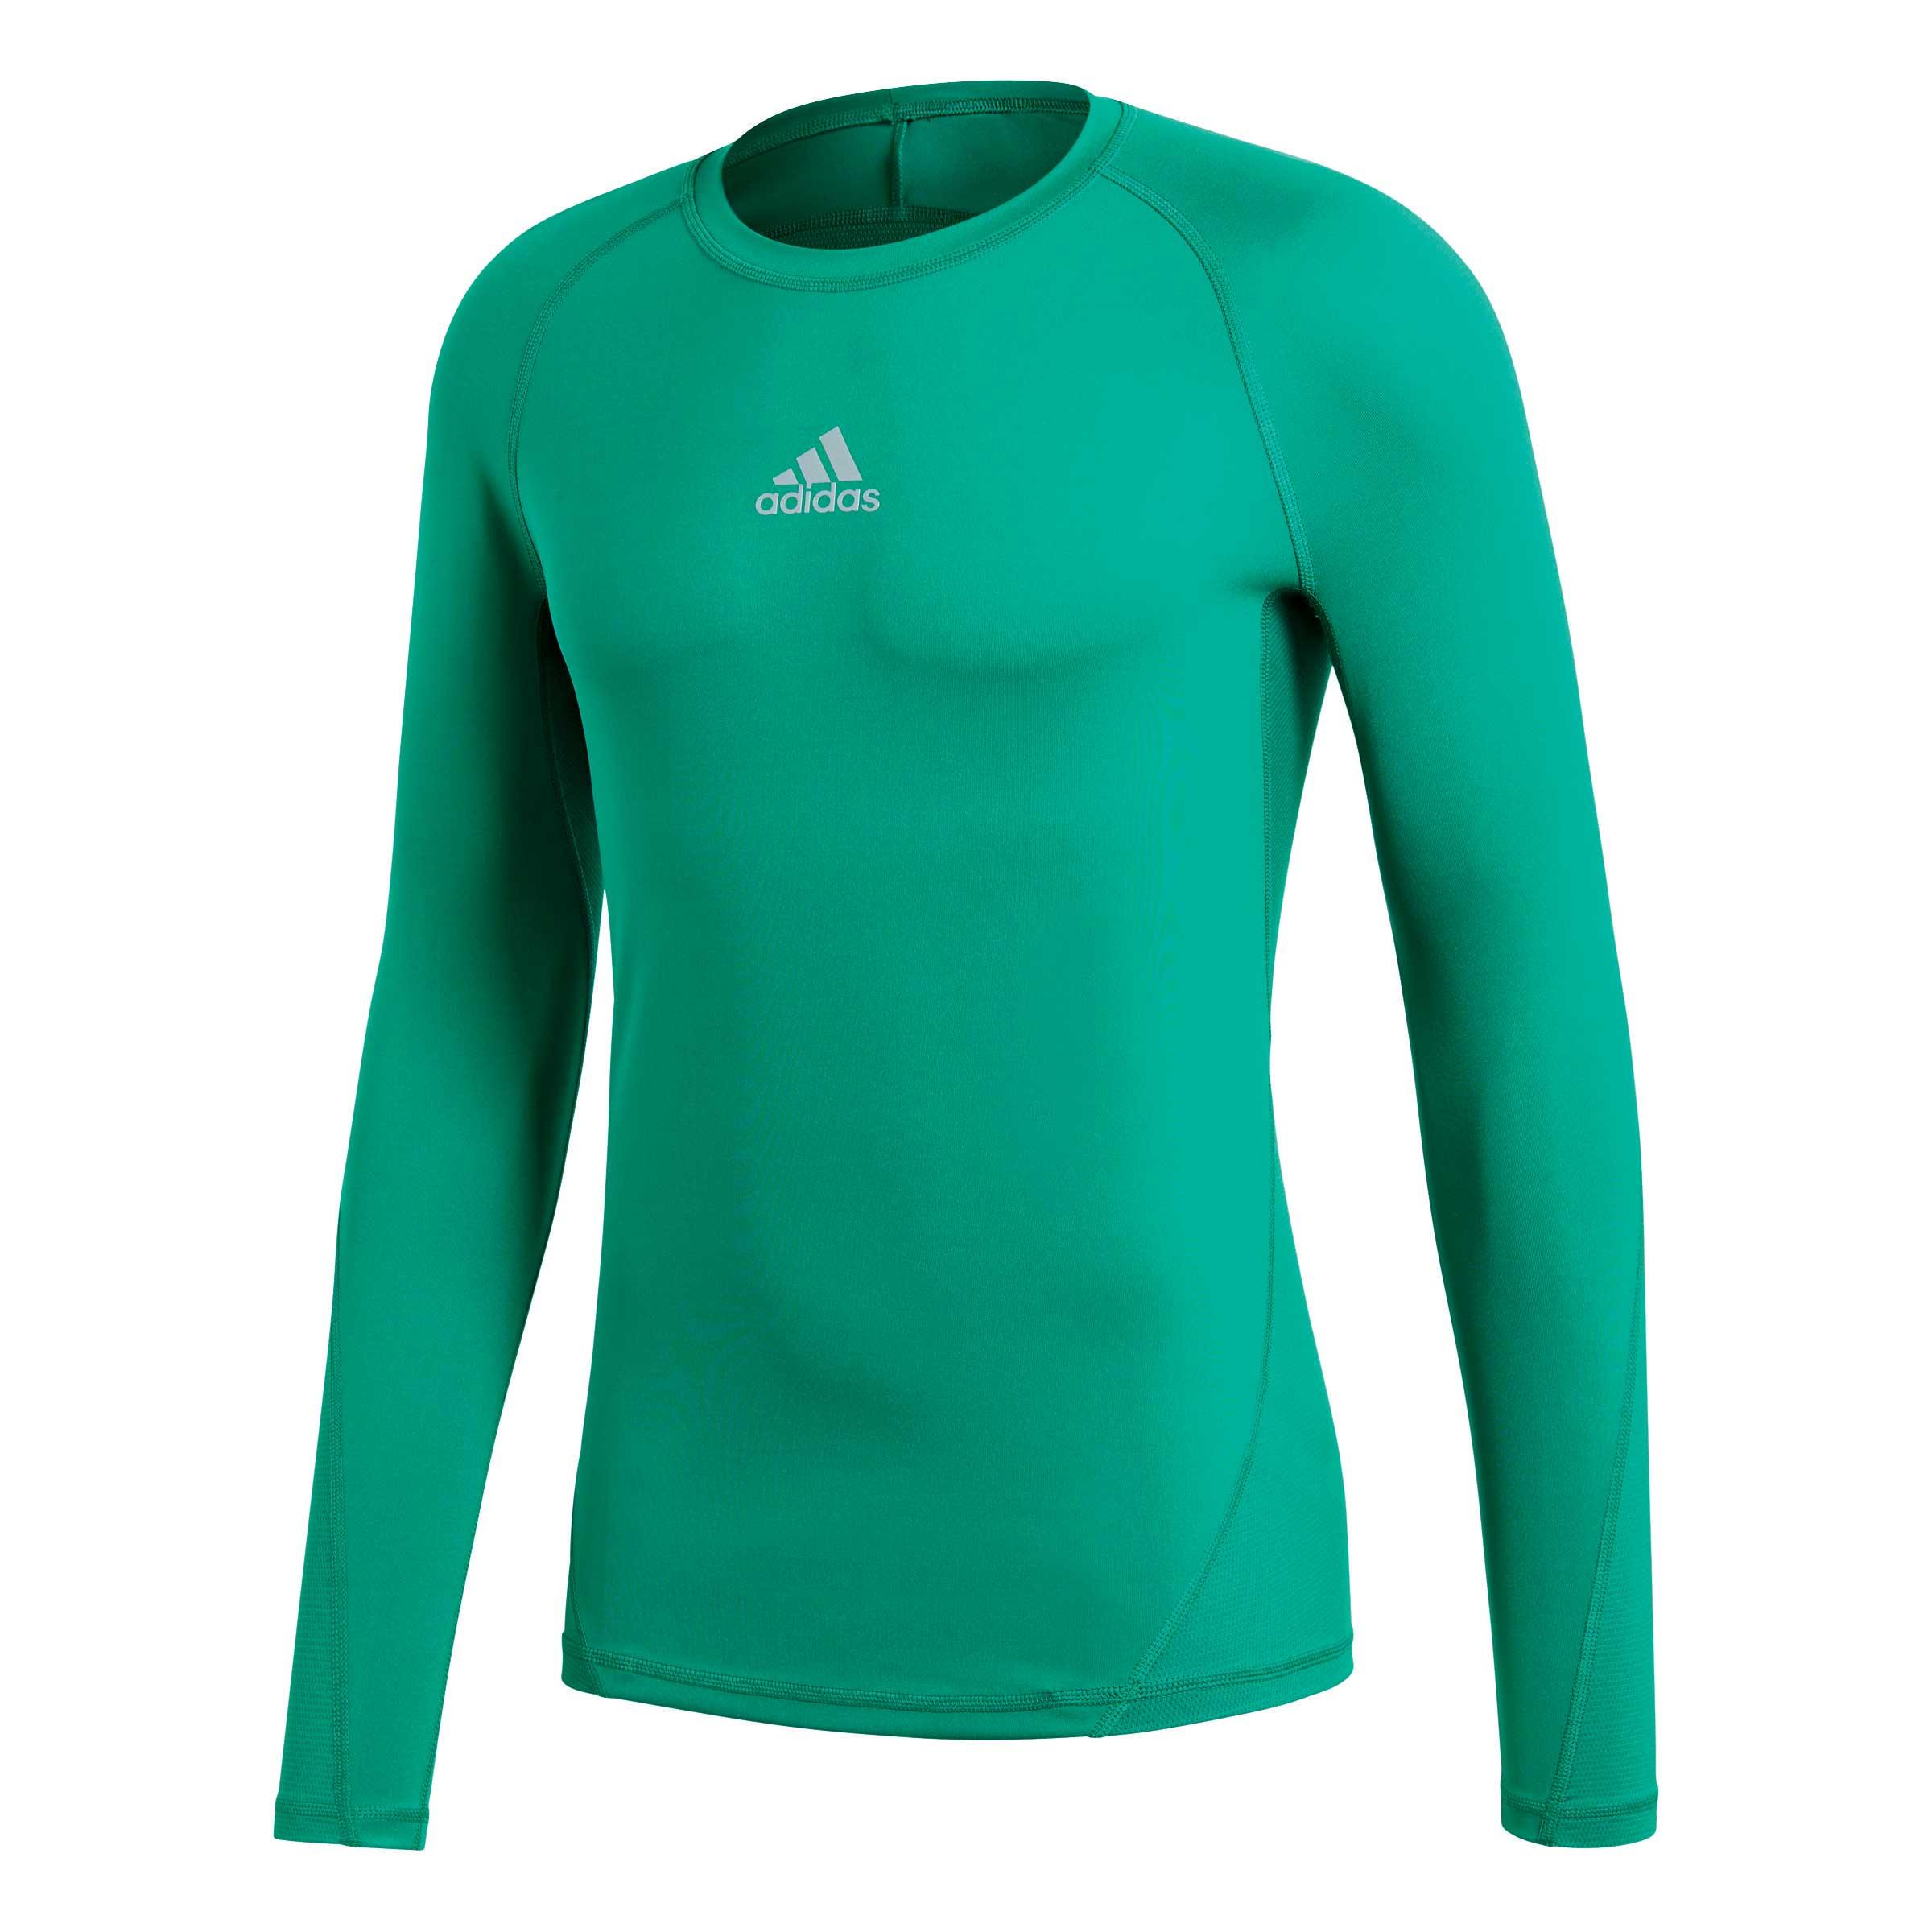 c74309fd785eb adidas Herren Langarm Shirt ALPHASKIN TECHFIT CW9504 S